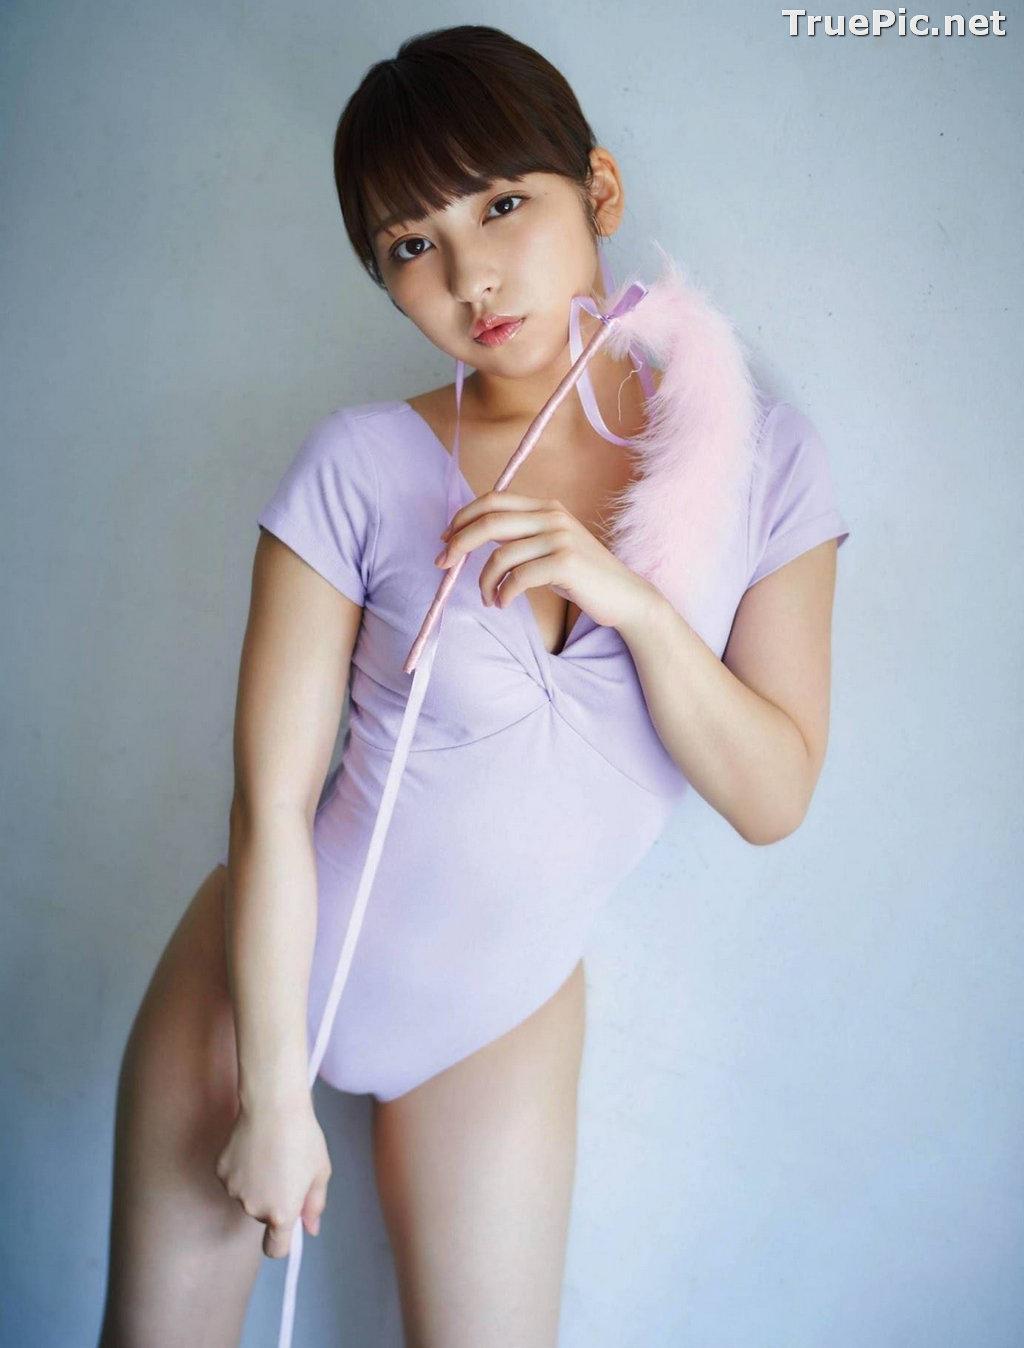 Image ENTAME 2019.12 - Japanese Cute Model - Toumi Nico - TruePic.net - Picture-4